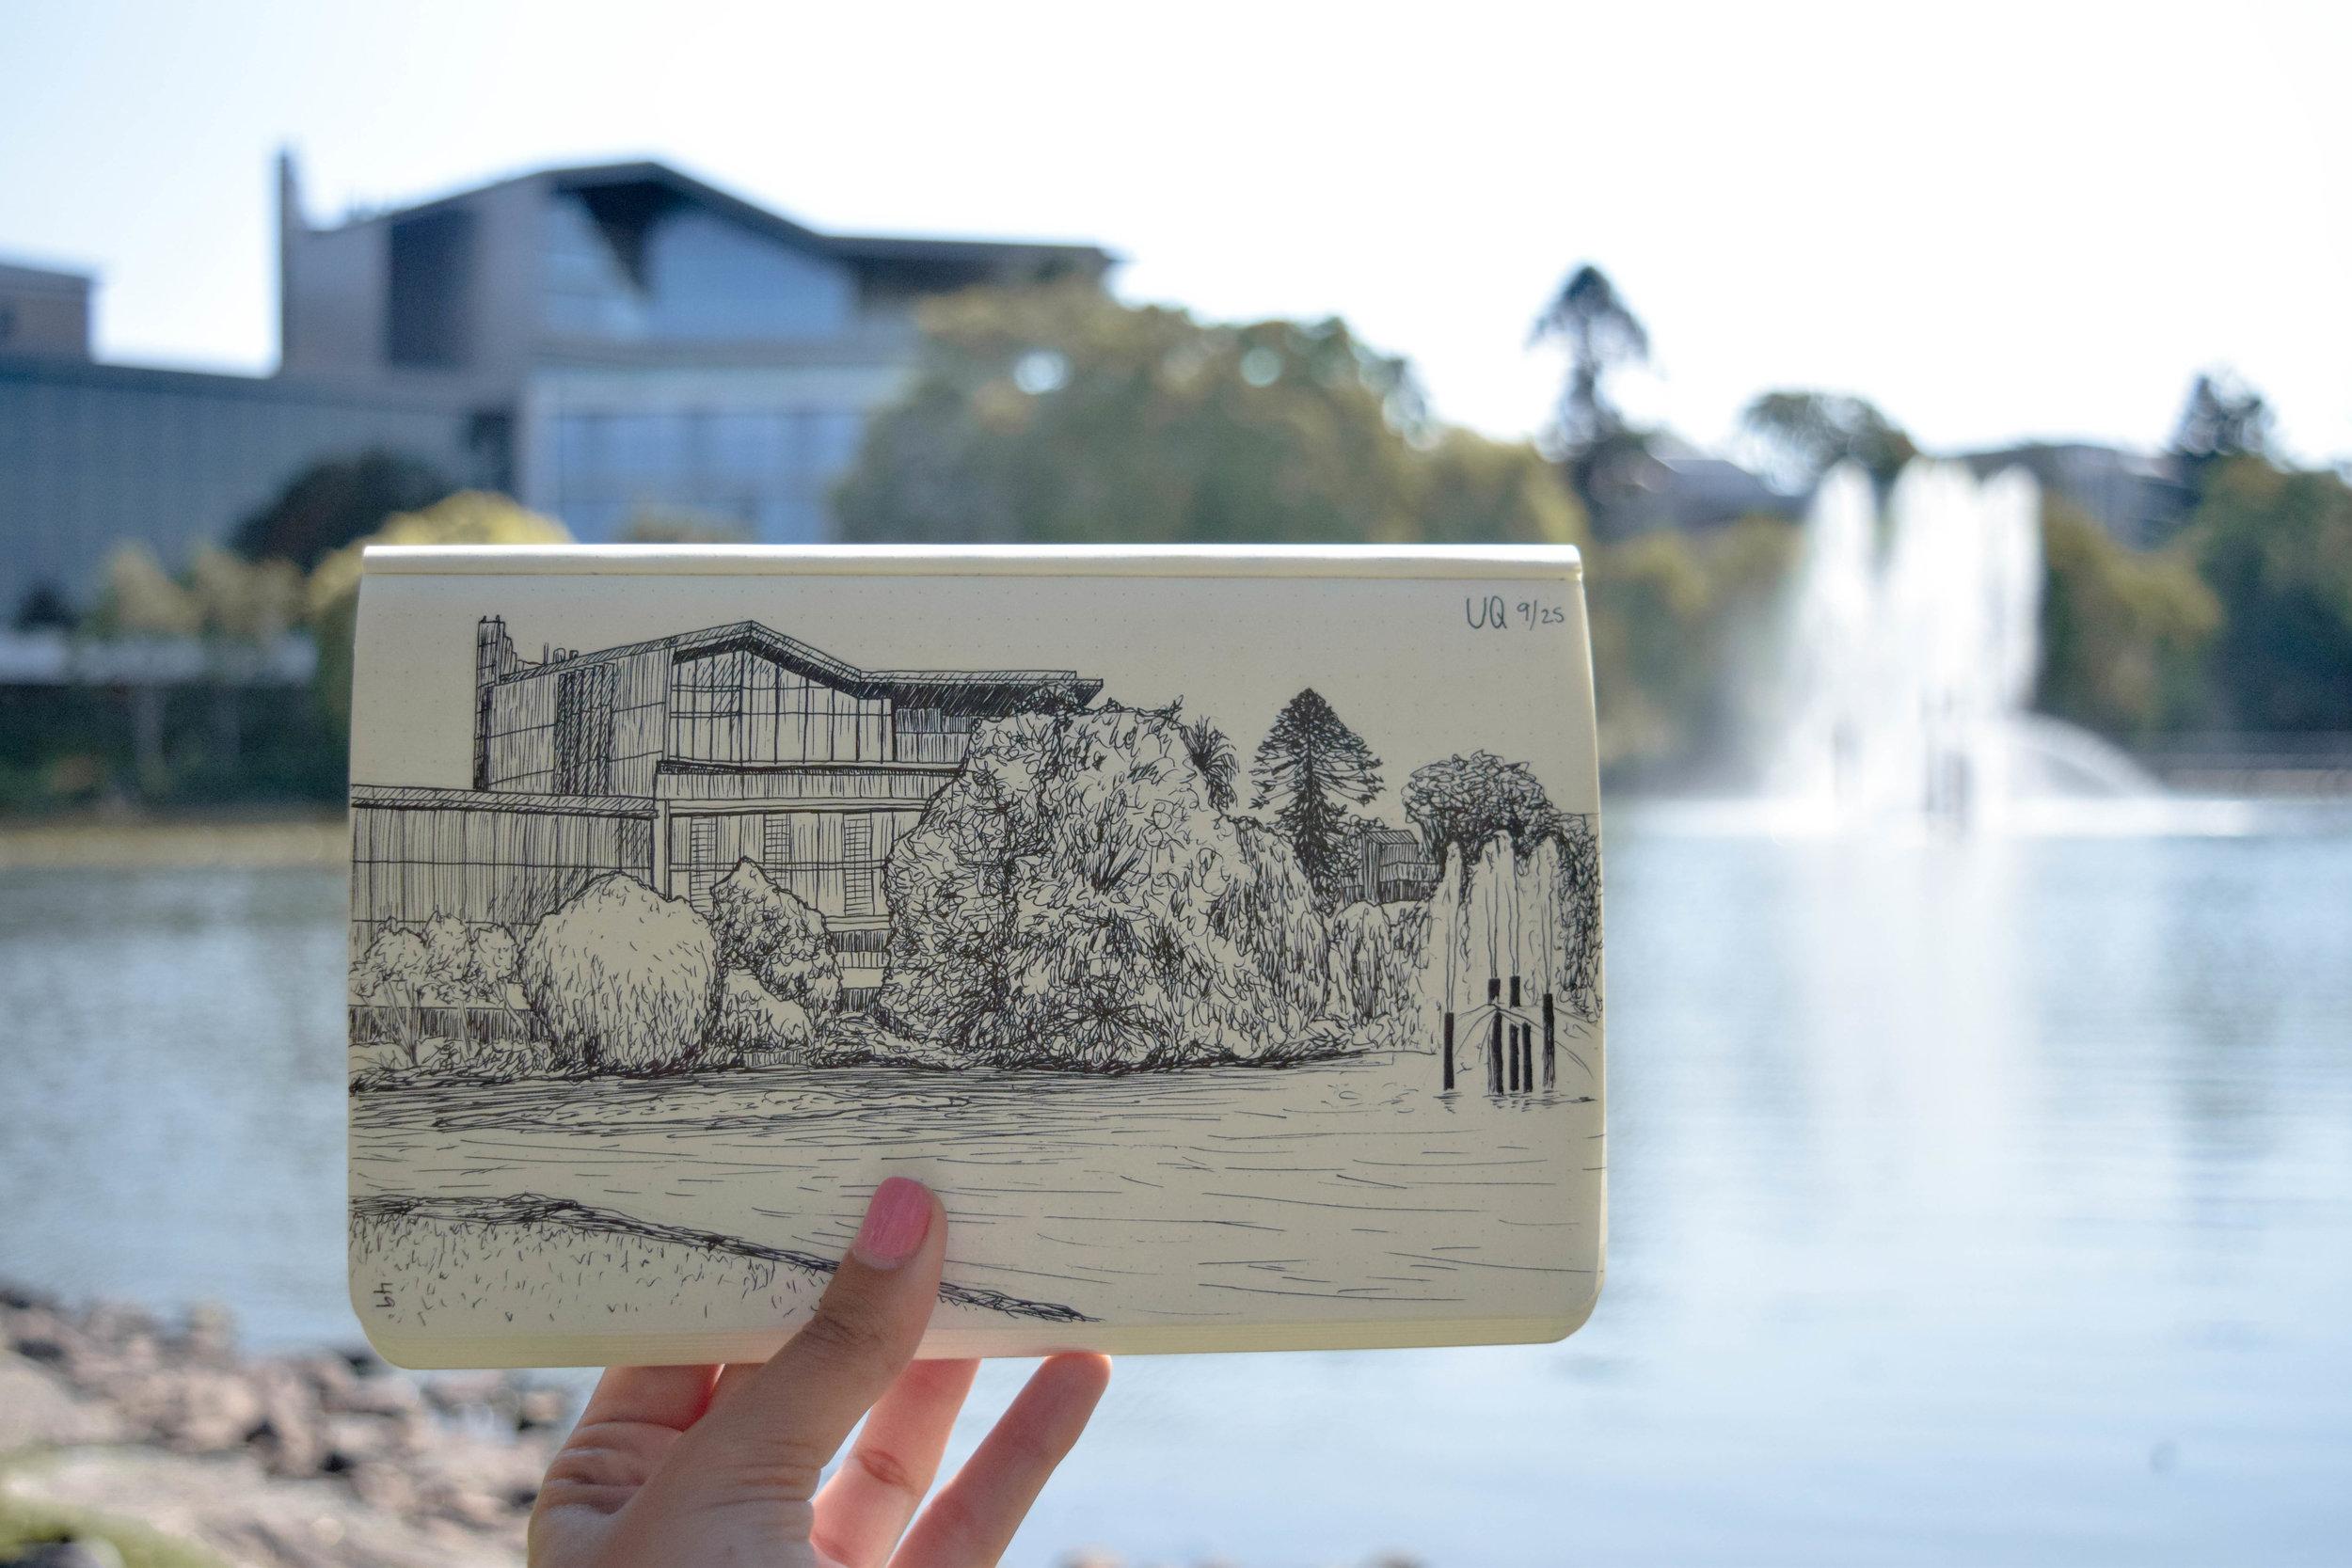 University of Queensland - Brisbane, QLD, Australia